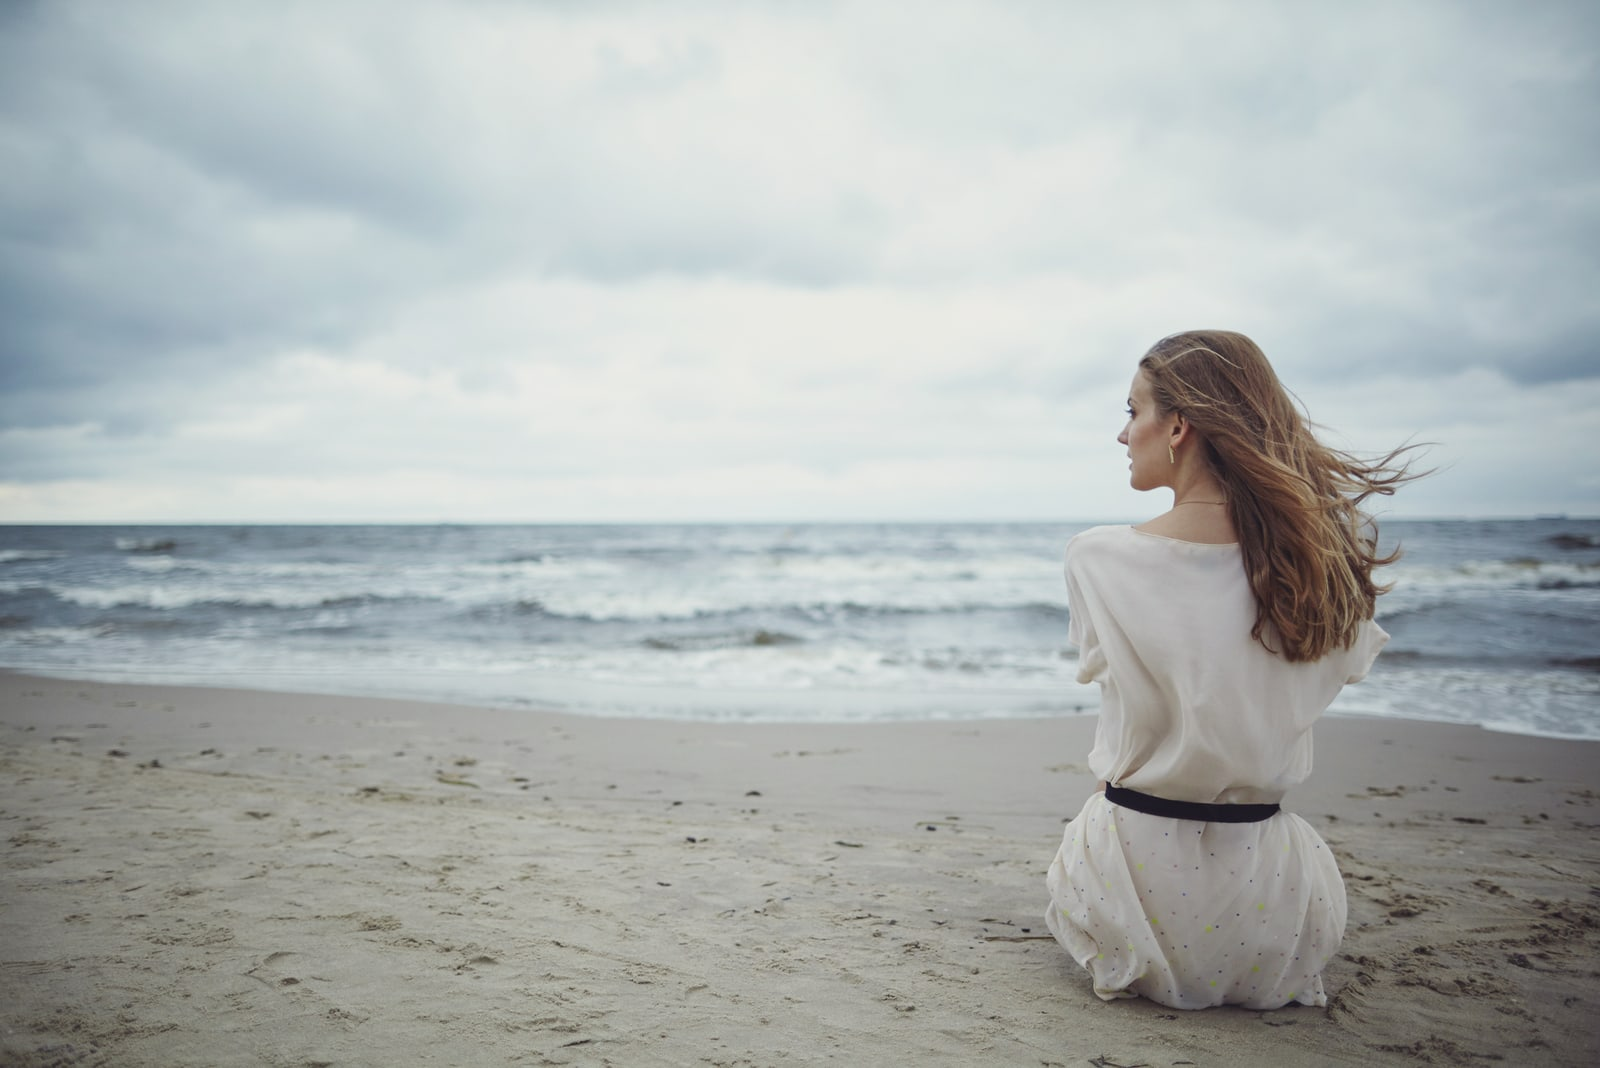 sensual girl on the beach